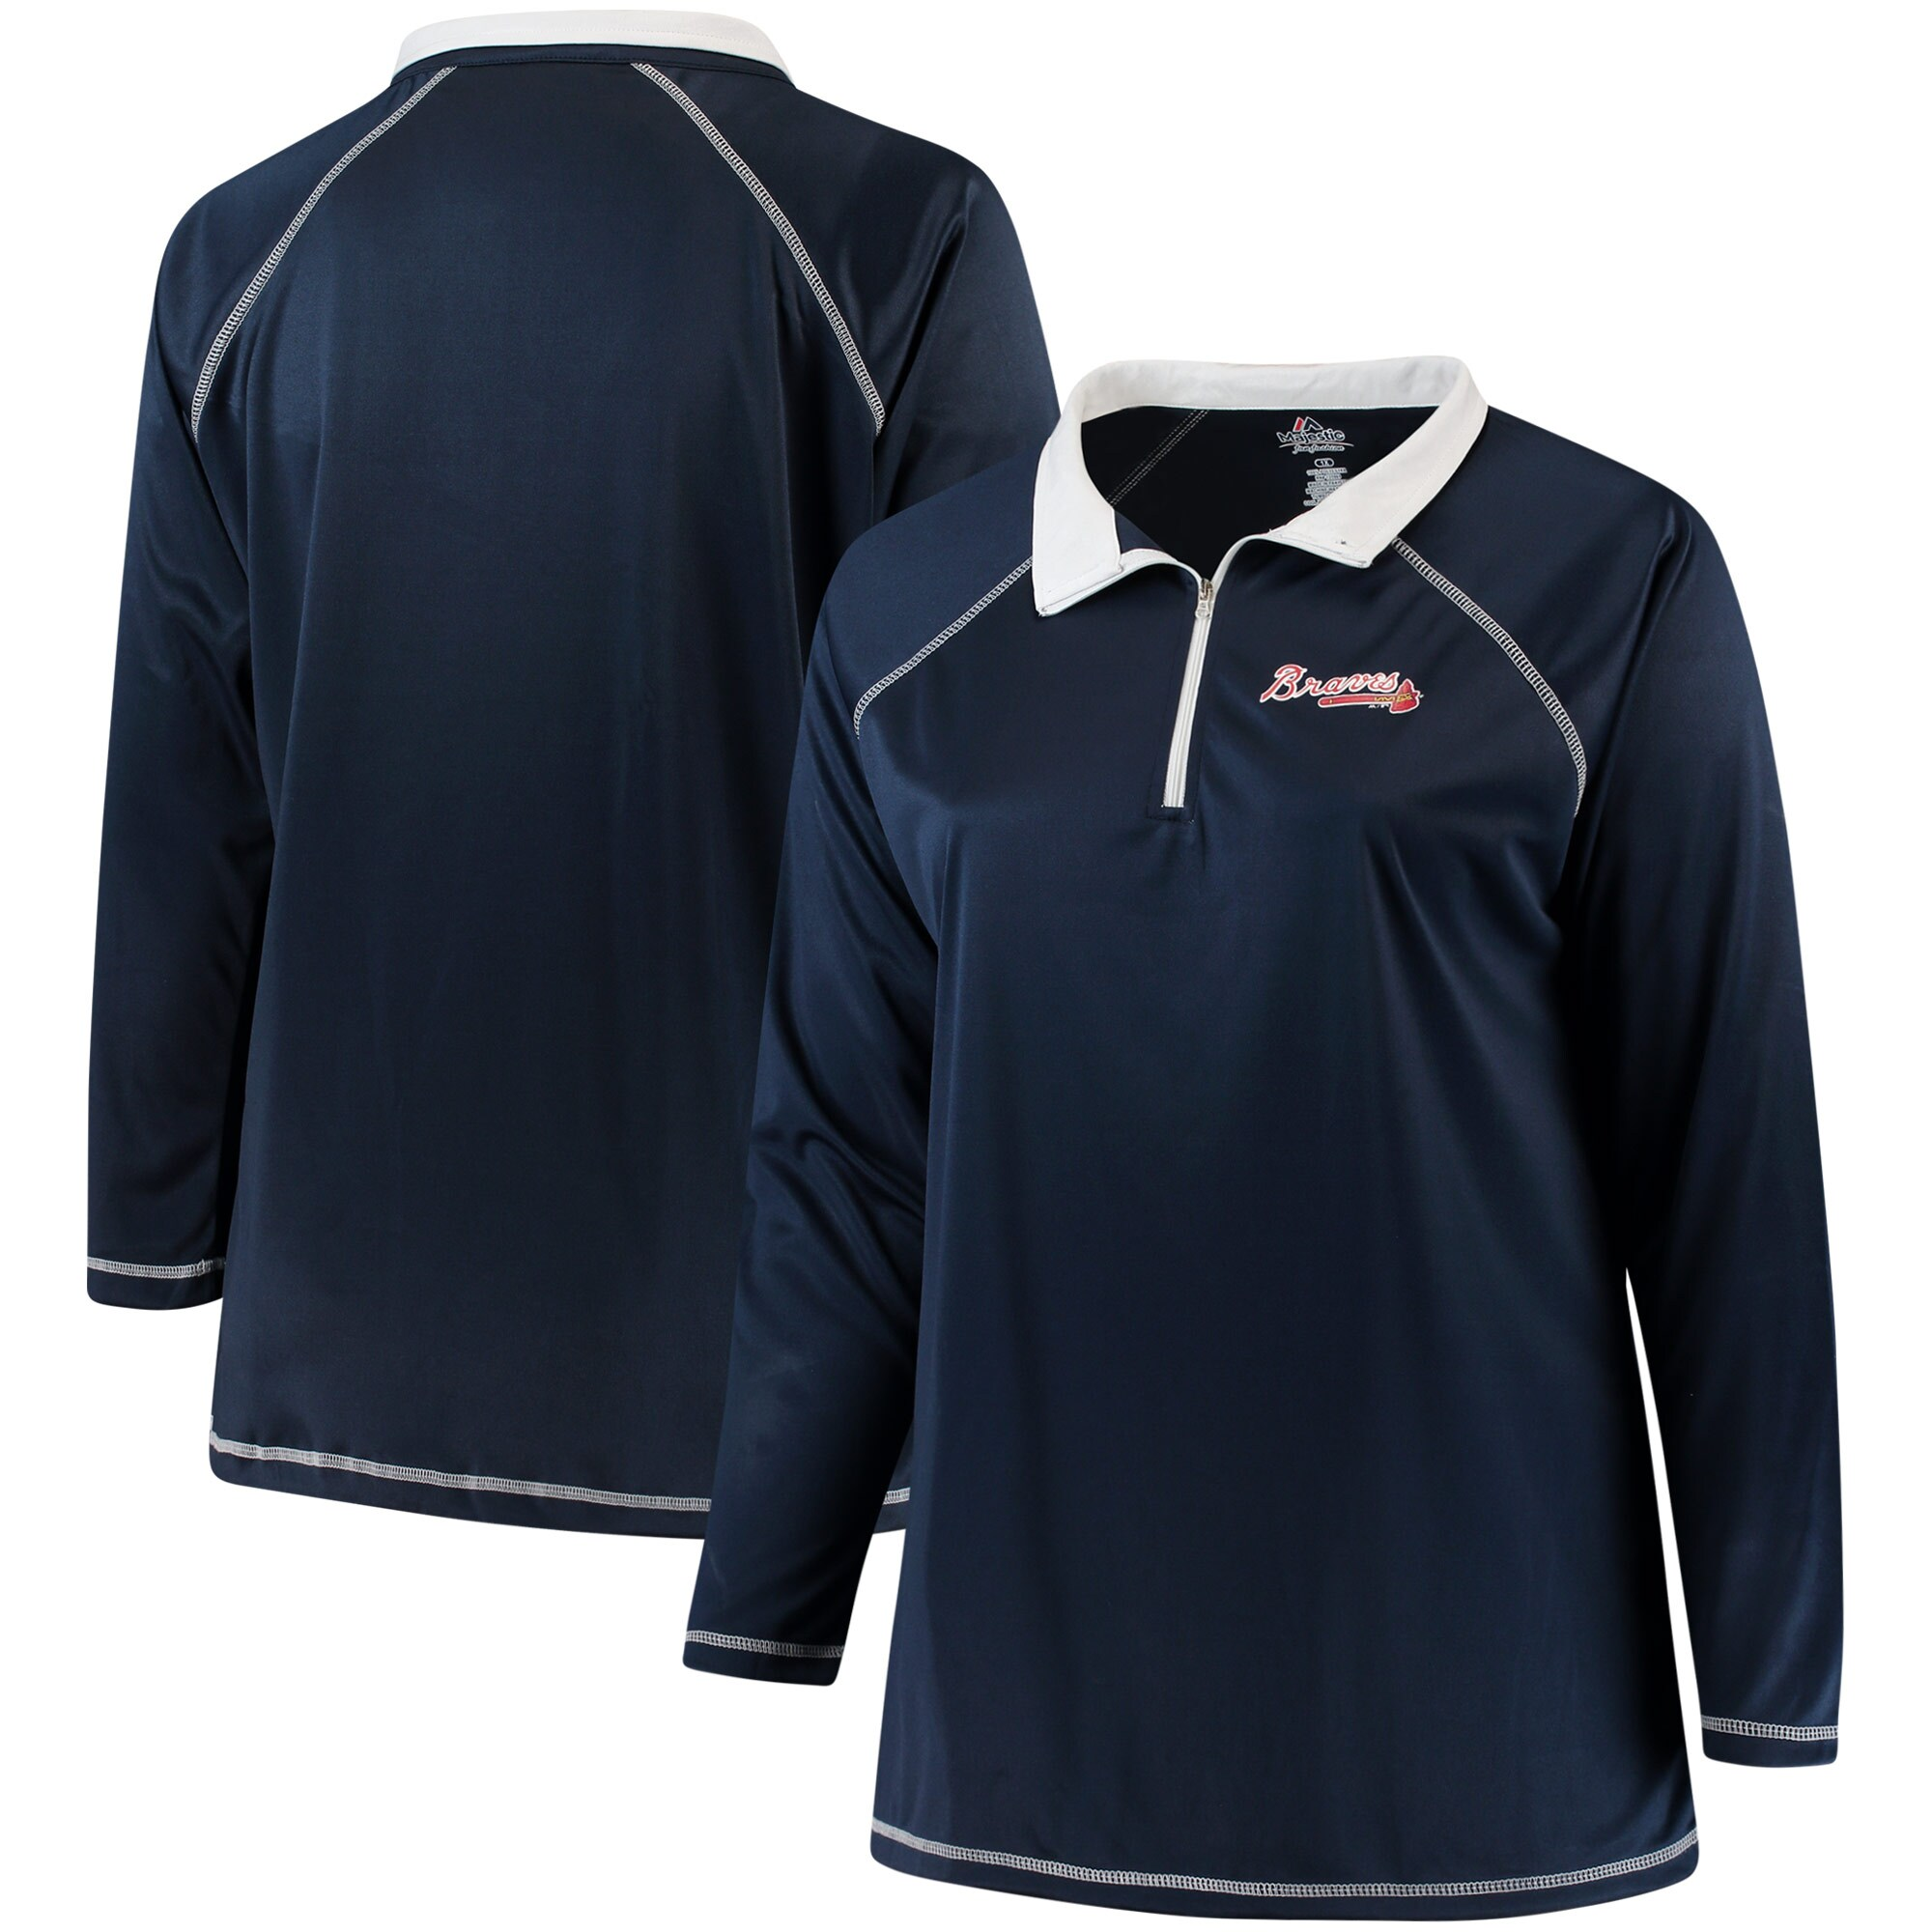 Atlanta Braves Majestic Women's Plus Size Quarter-Zip Pullover Jacket - Navy